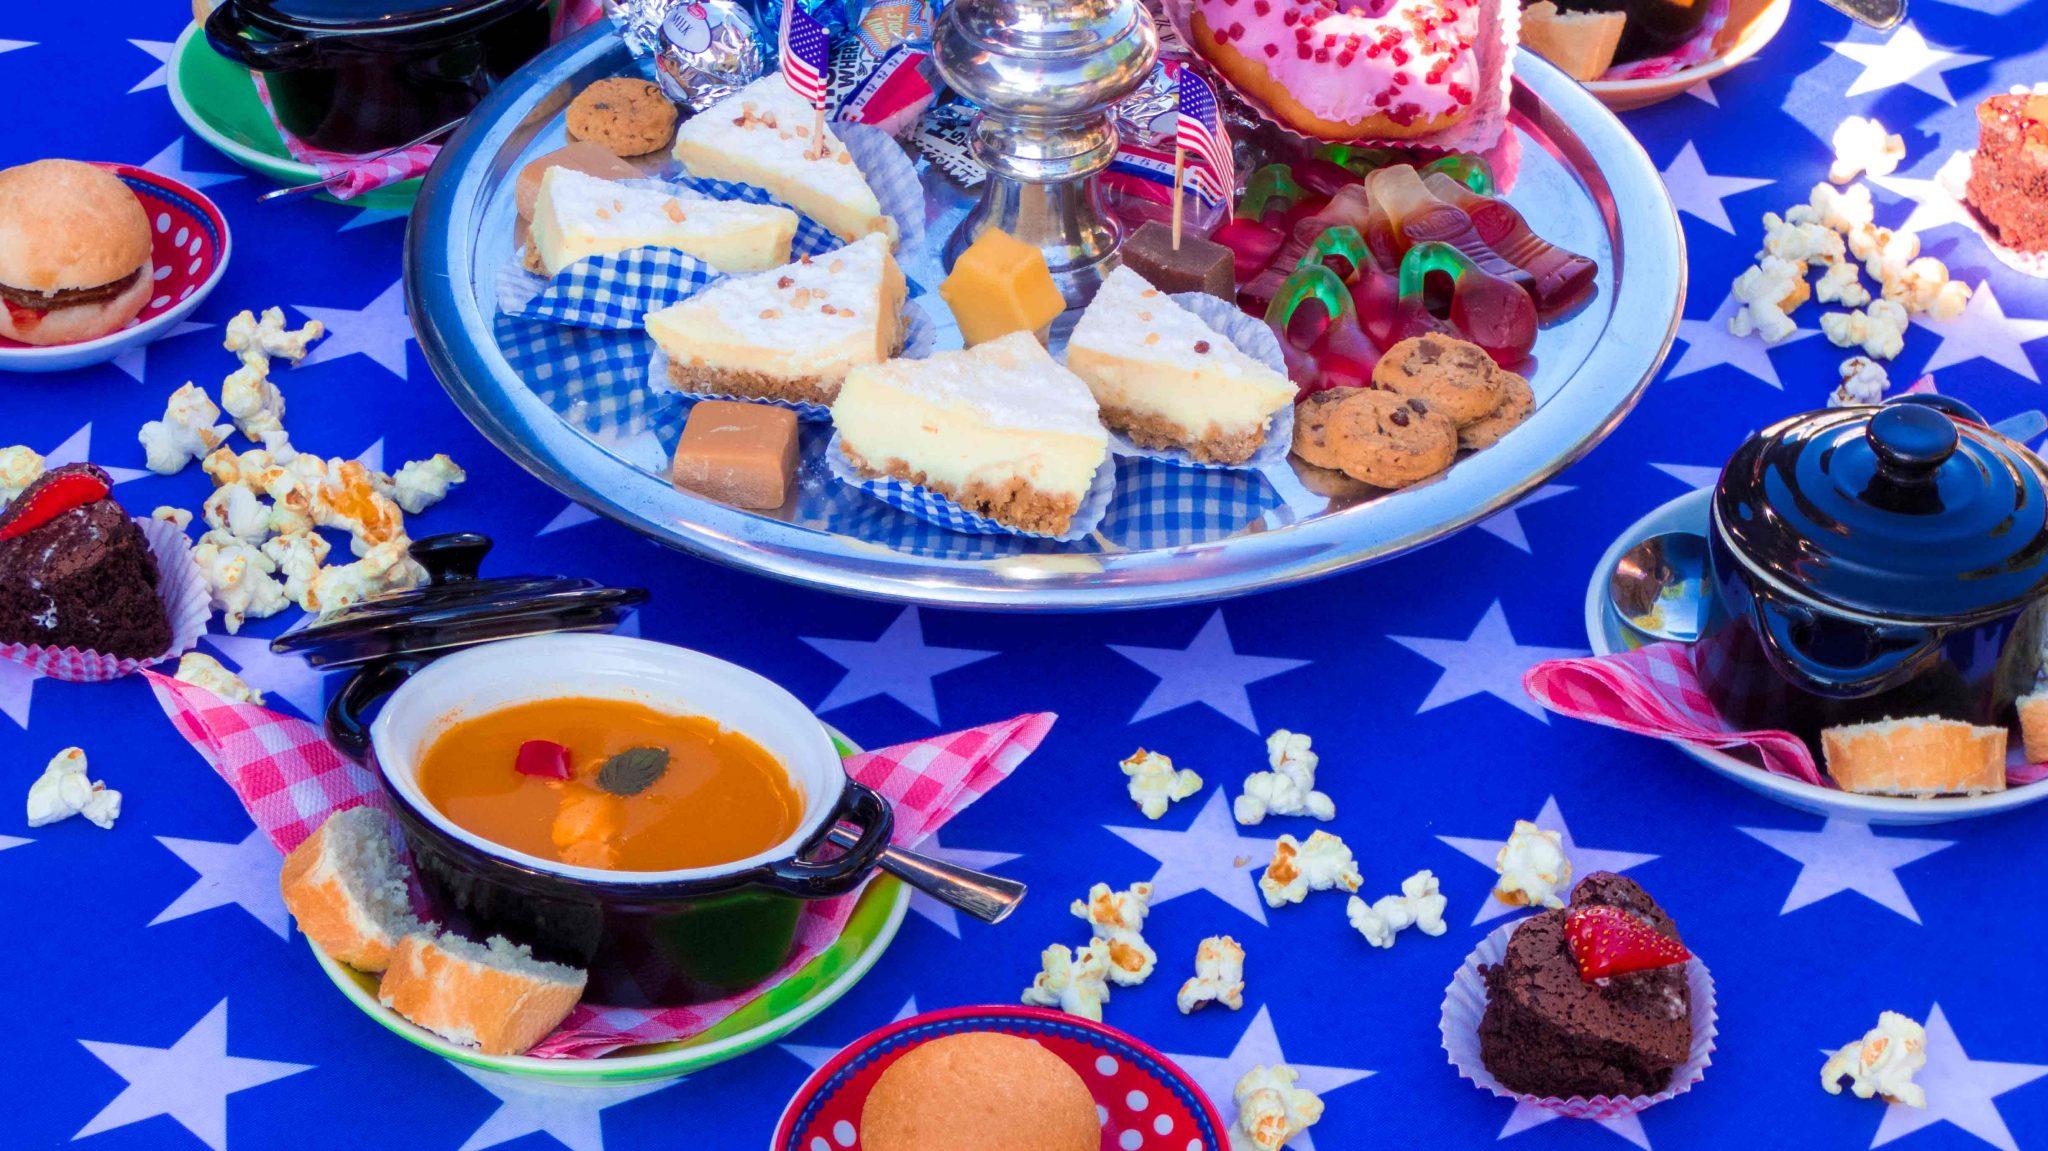 De Foute Amerikaanse Tea Party, Amerikaanse High tea, Lunchroom Bij Saartje